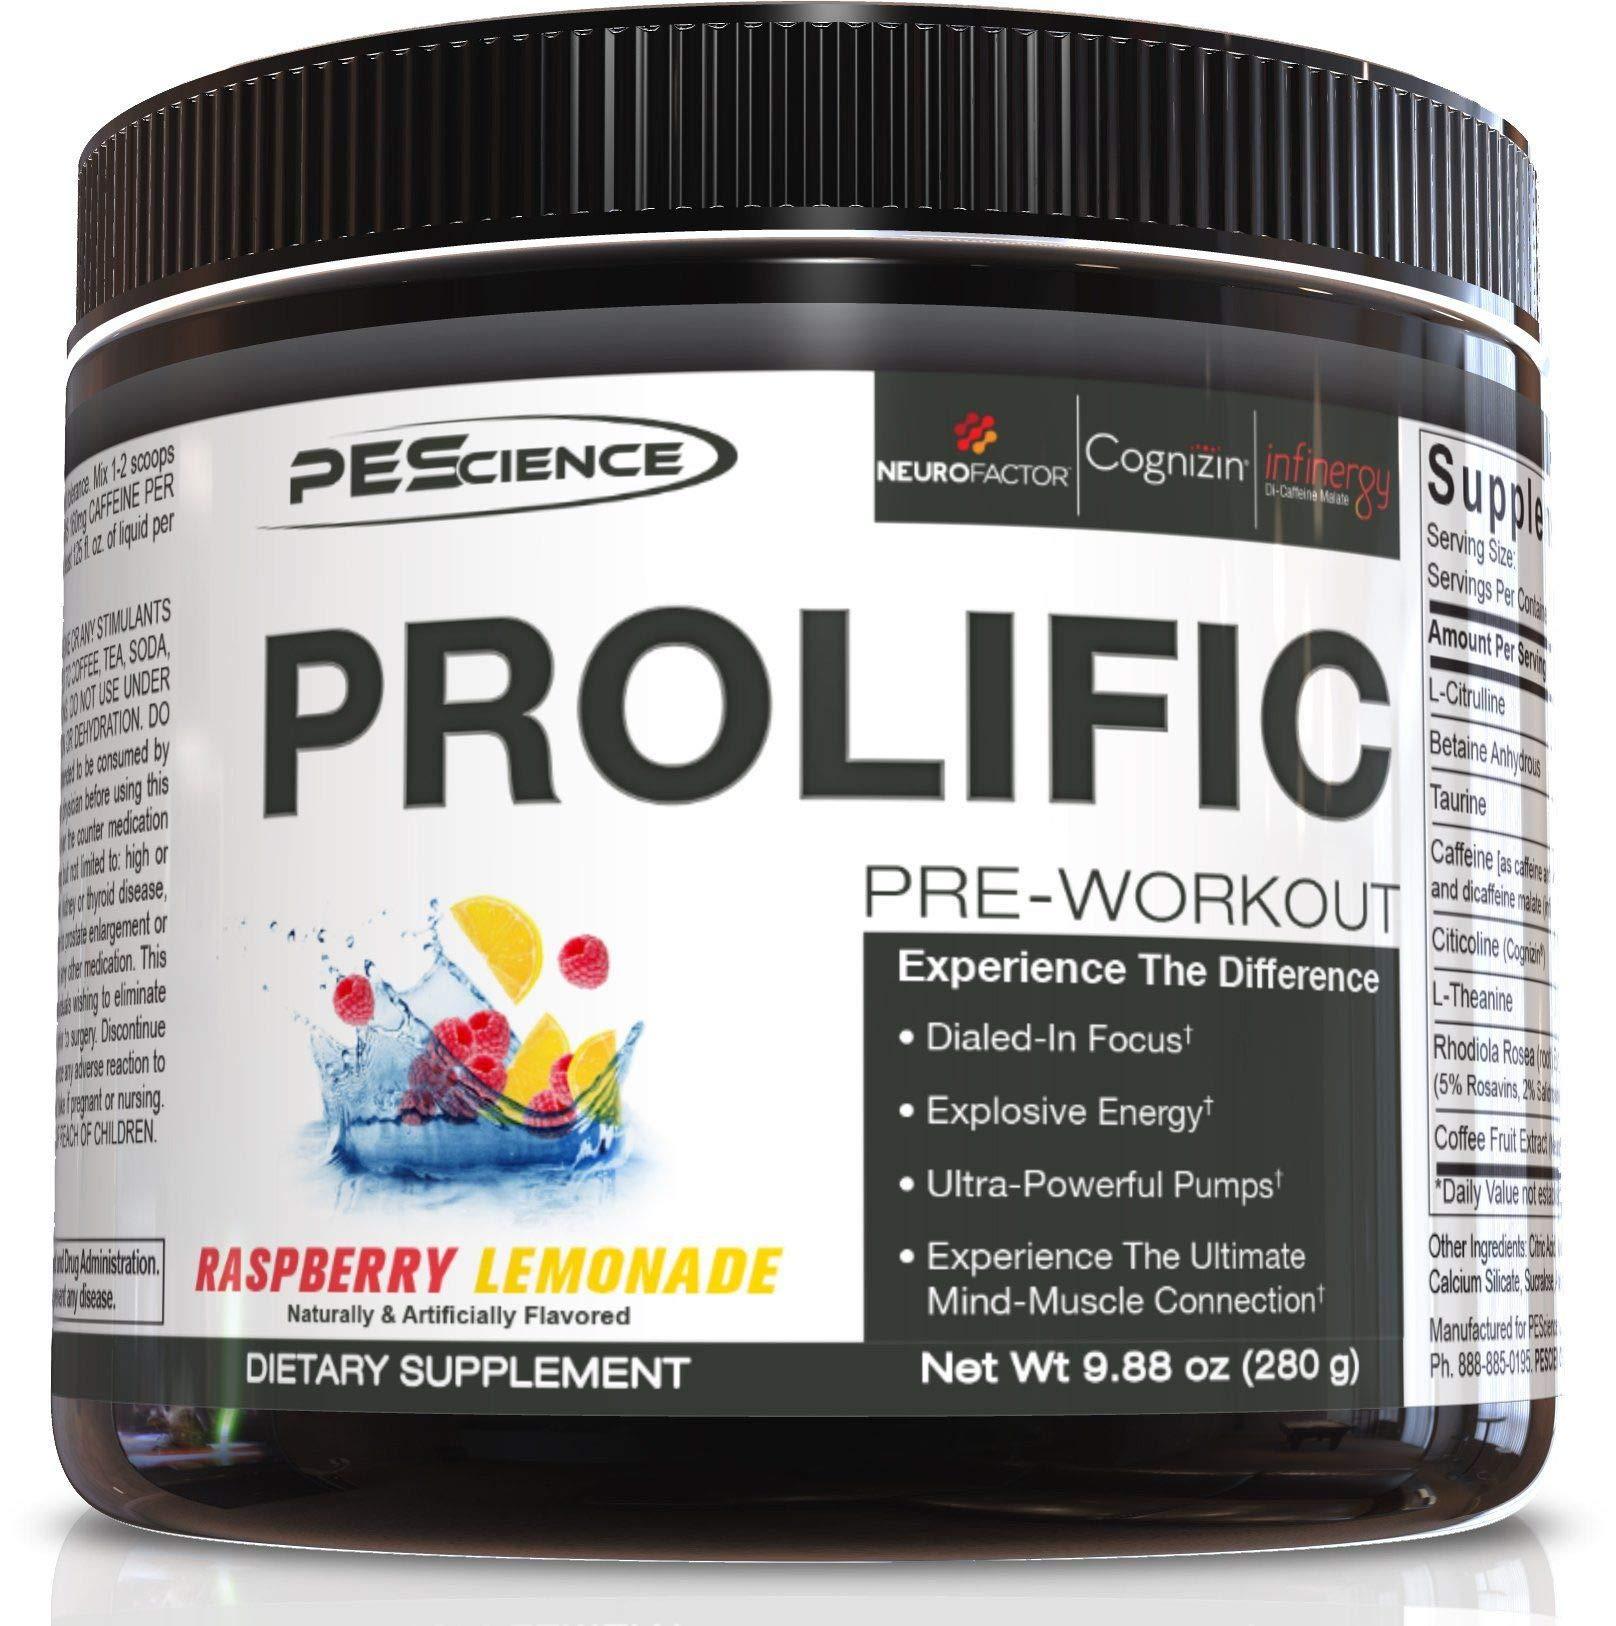 PEScience Prolific Preworkout Powder, Raspberry Lemonade, 40 Scoops by PEScience